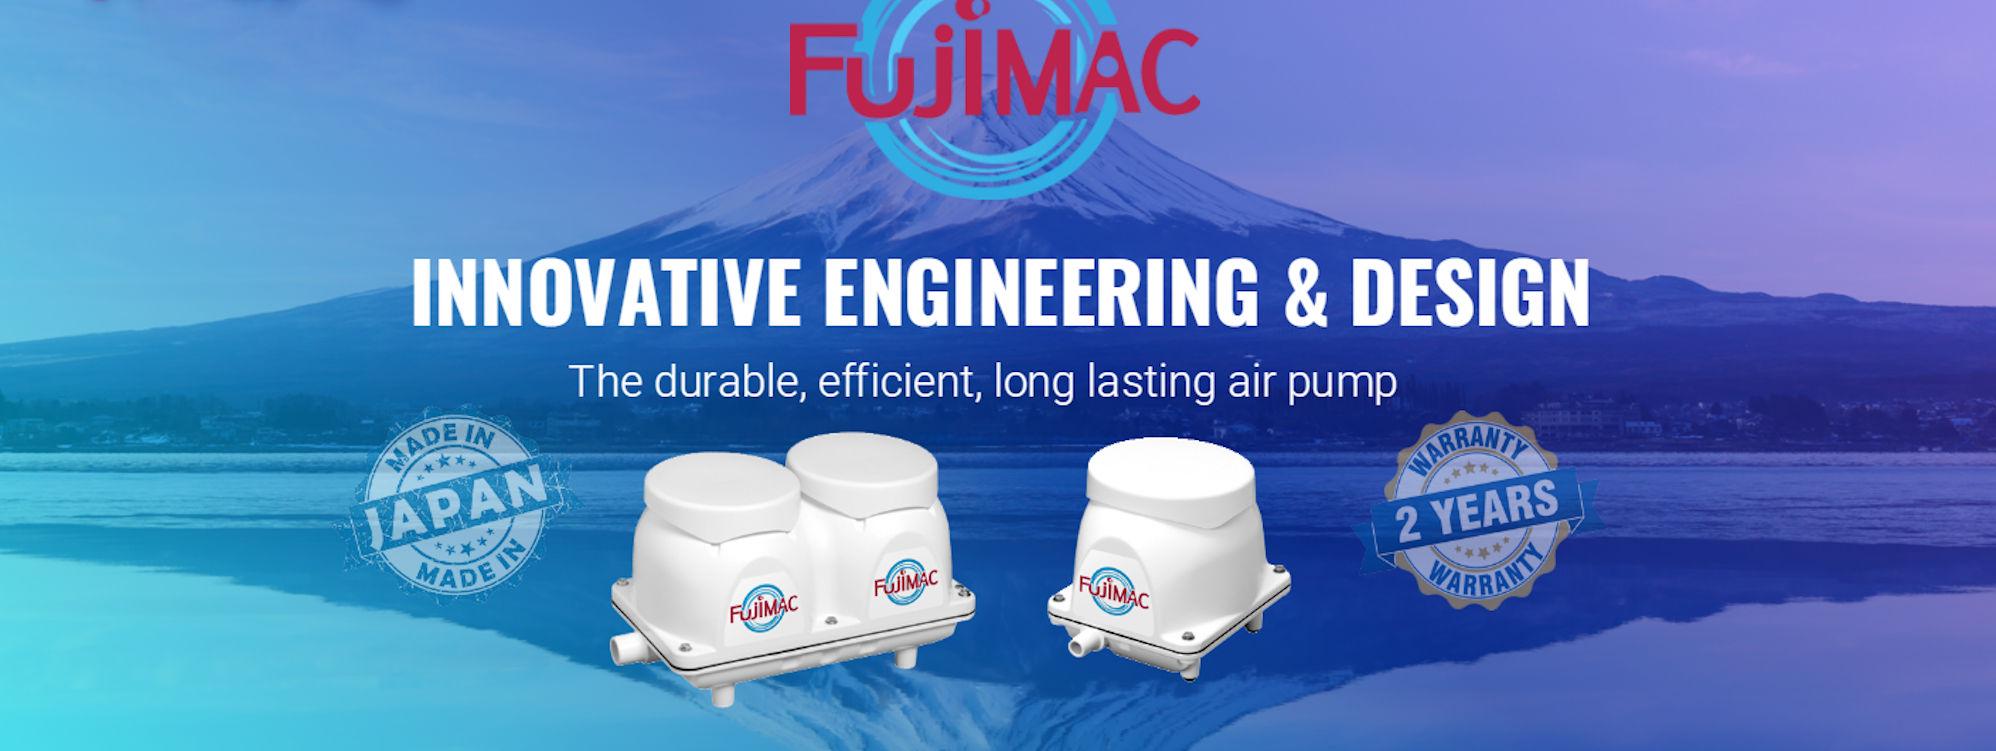 FujiMac_linear_diaphragm_blower_slide